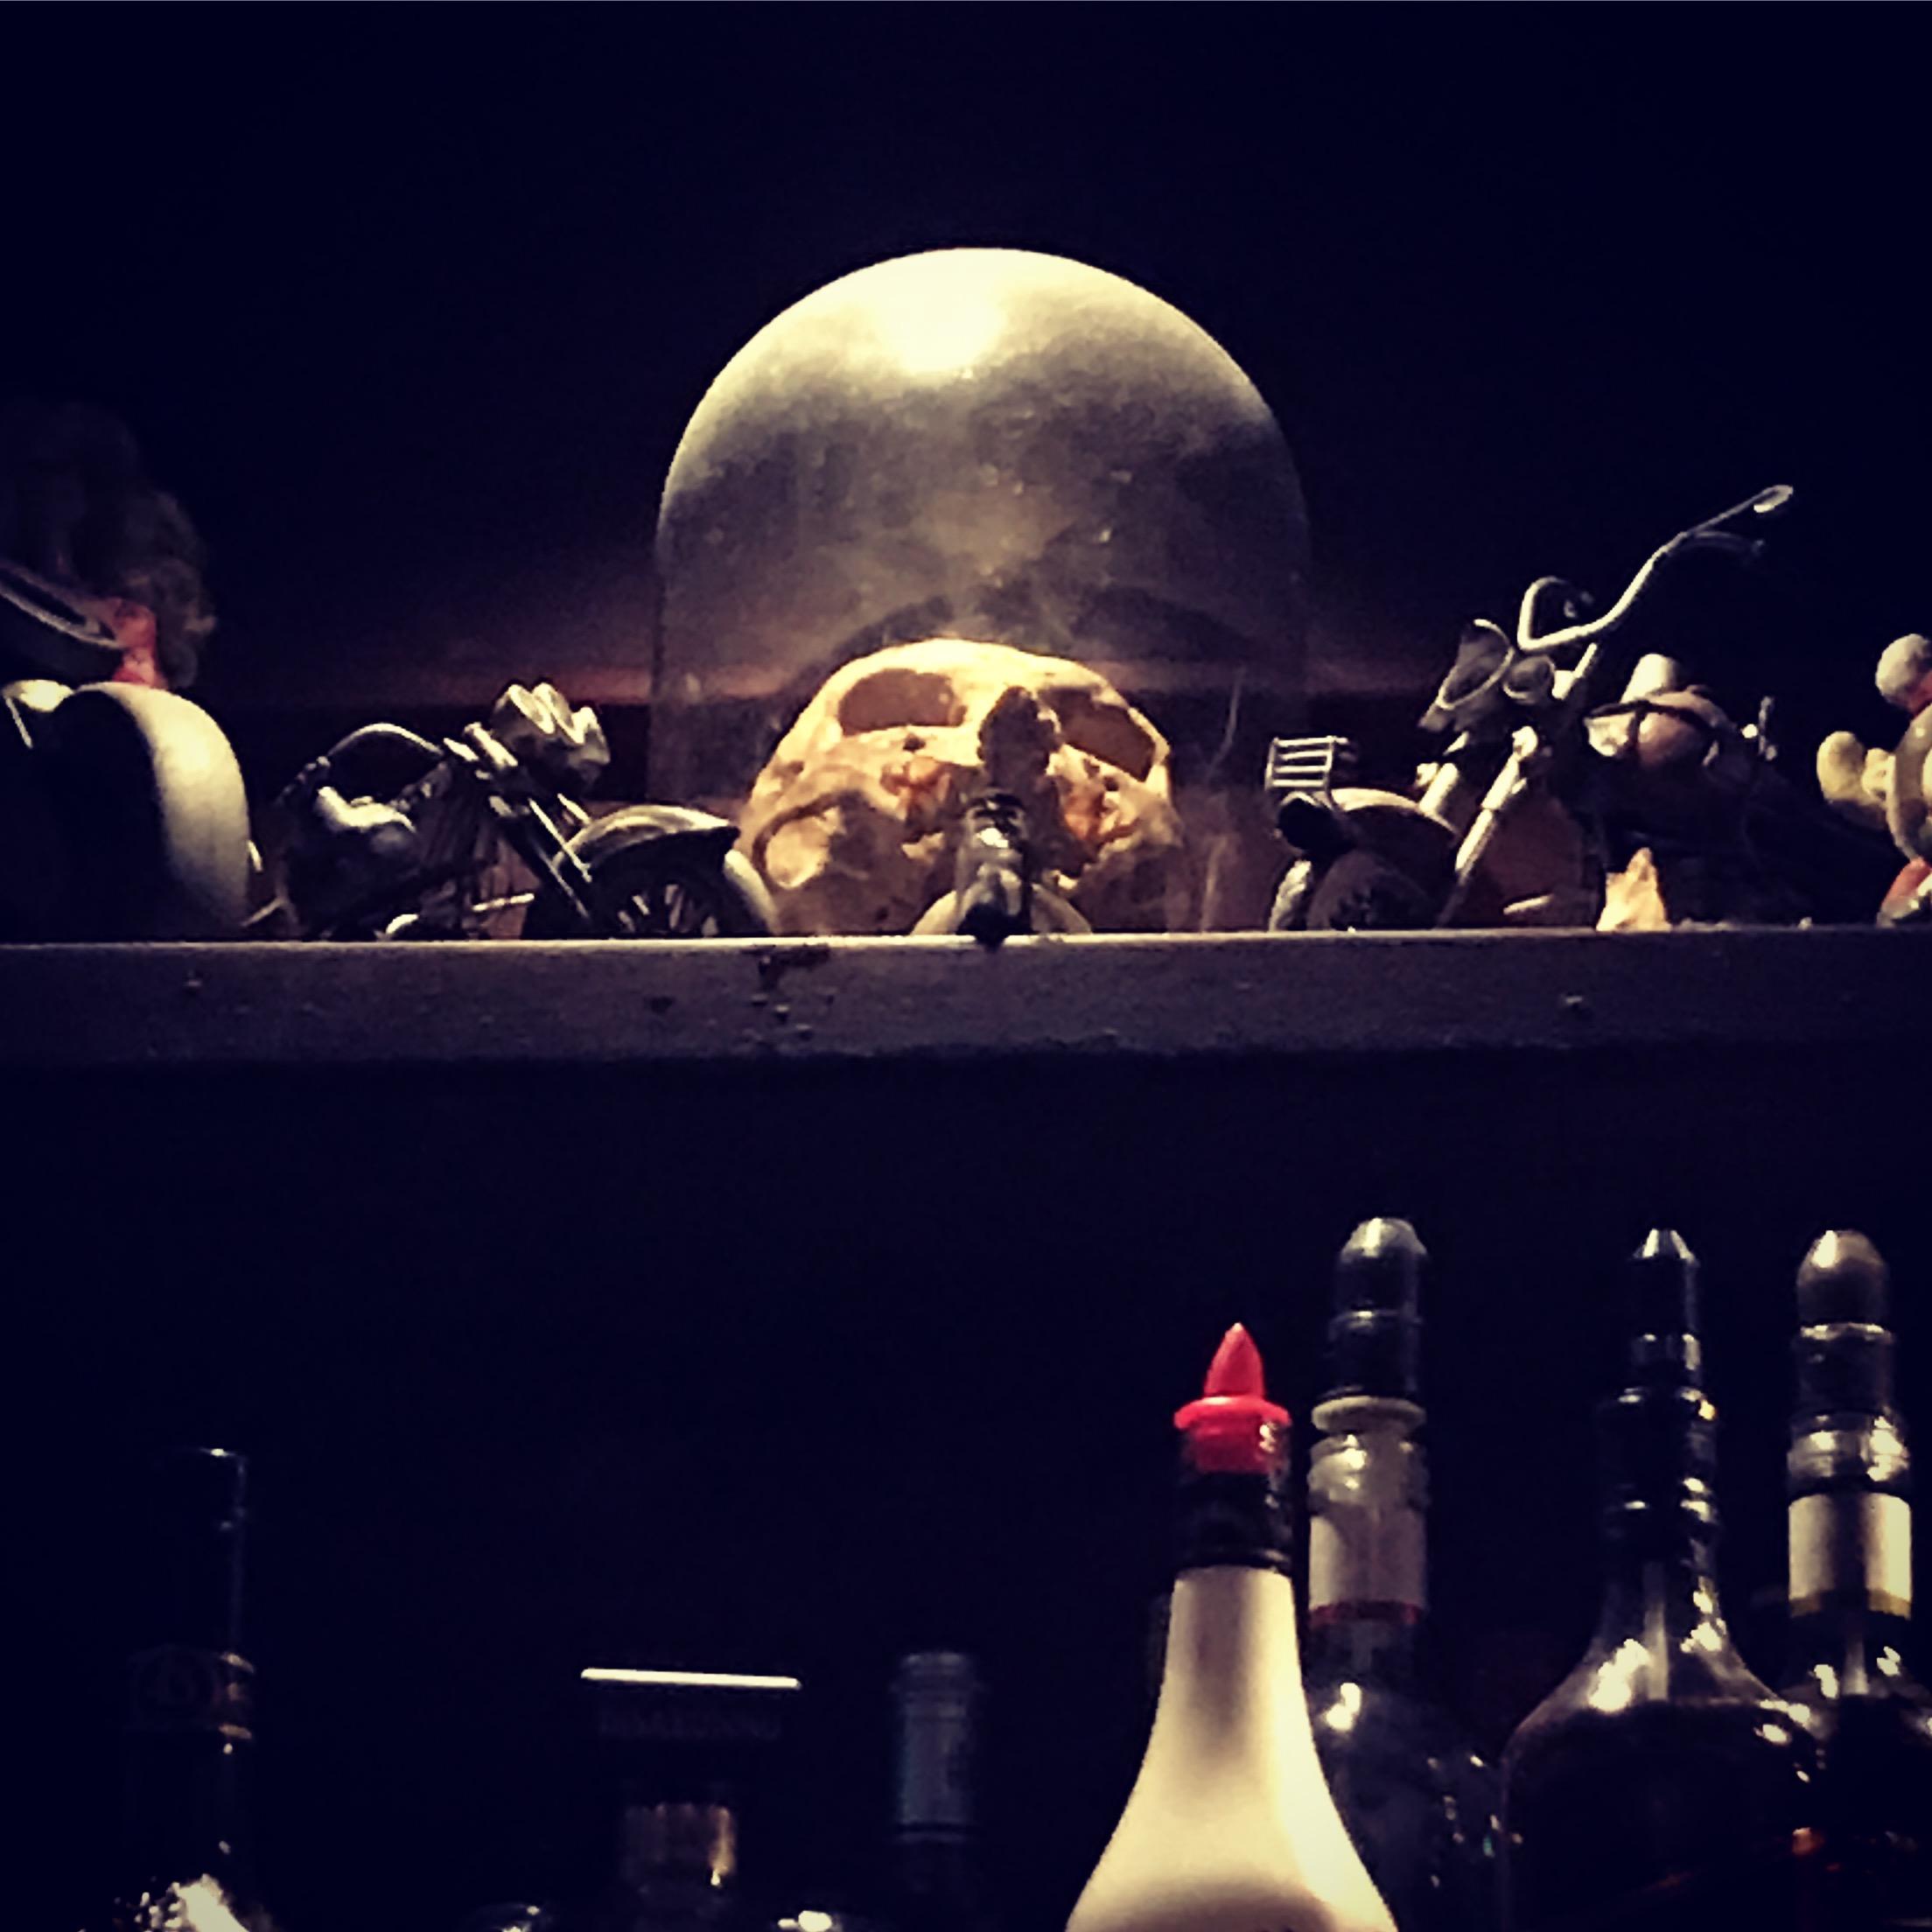 Excalibur Bar, Amsterdam 3/25/18